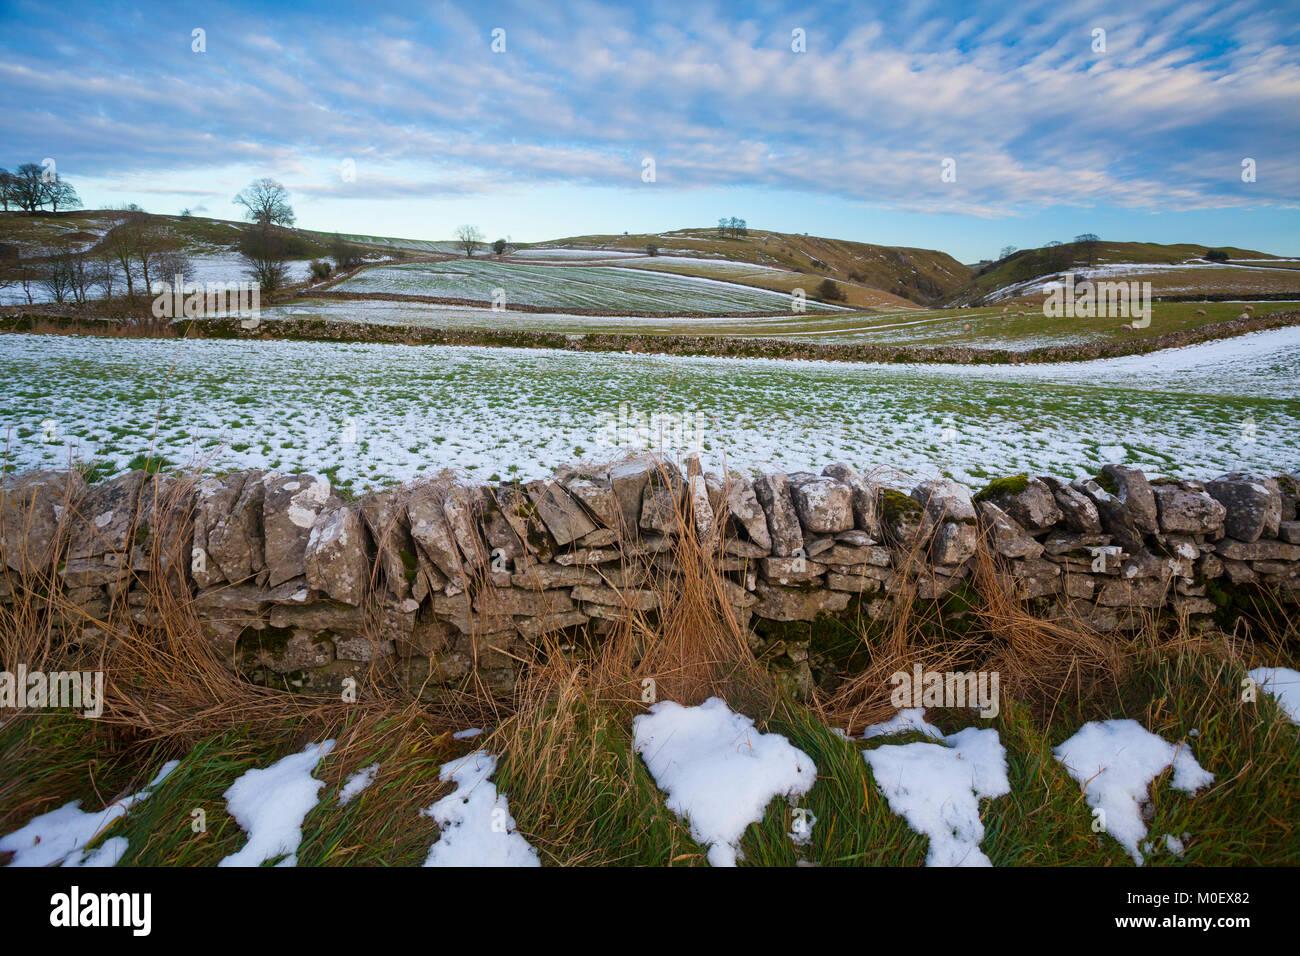 PEAK DISTRICT NATIONAL PARK, Stanshope, Ashbourne, Derbyshire, UK. January - Stock Image